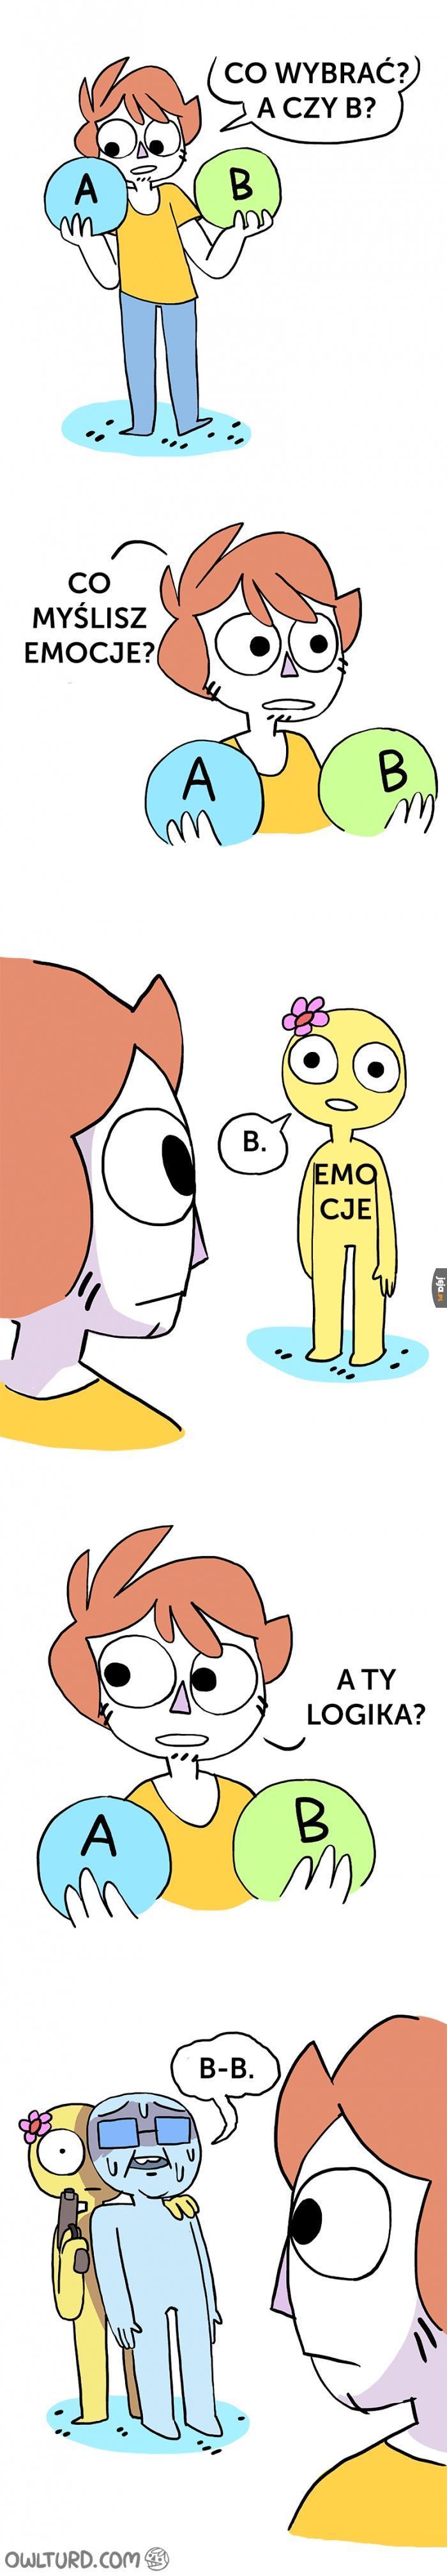 Emocje vs Logika